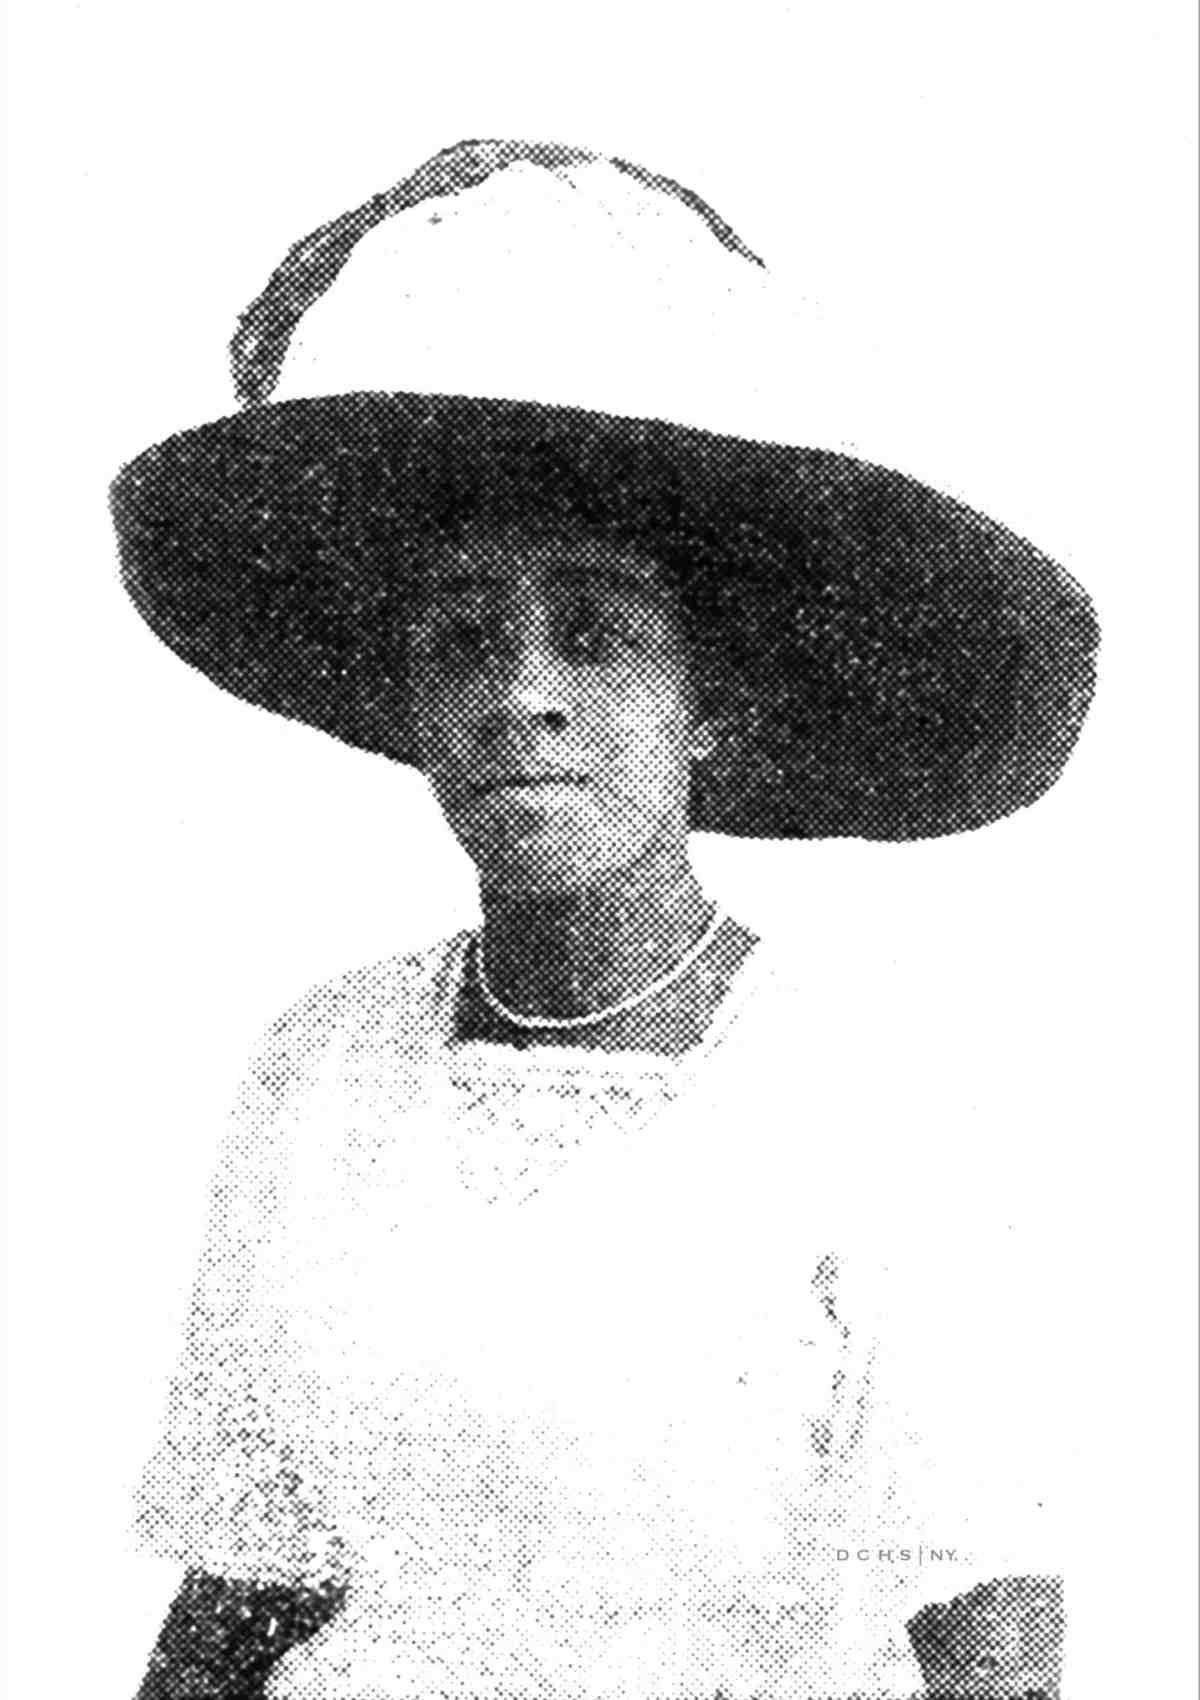 DCHS Sadie Peterson 1915 Quill